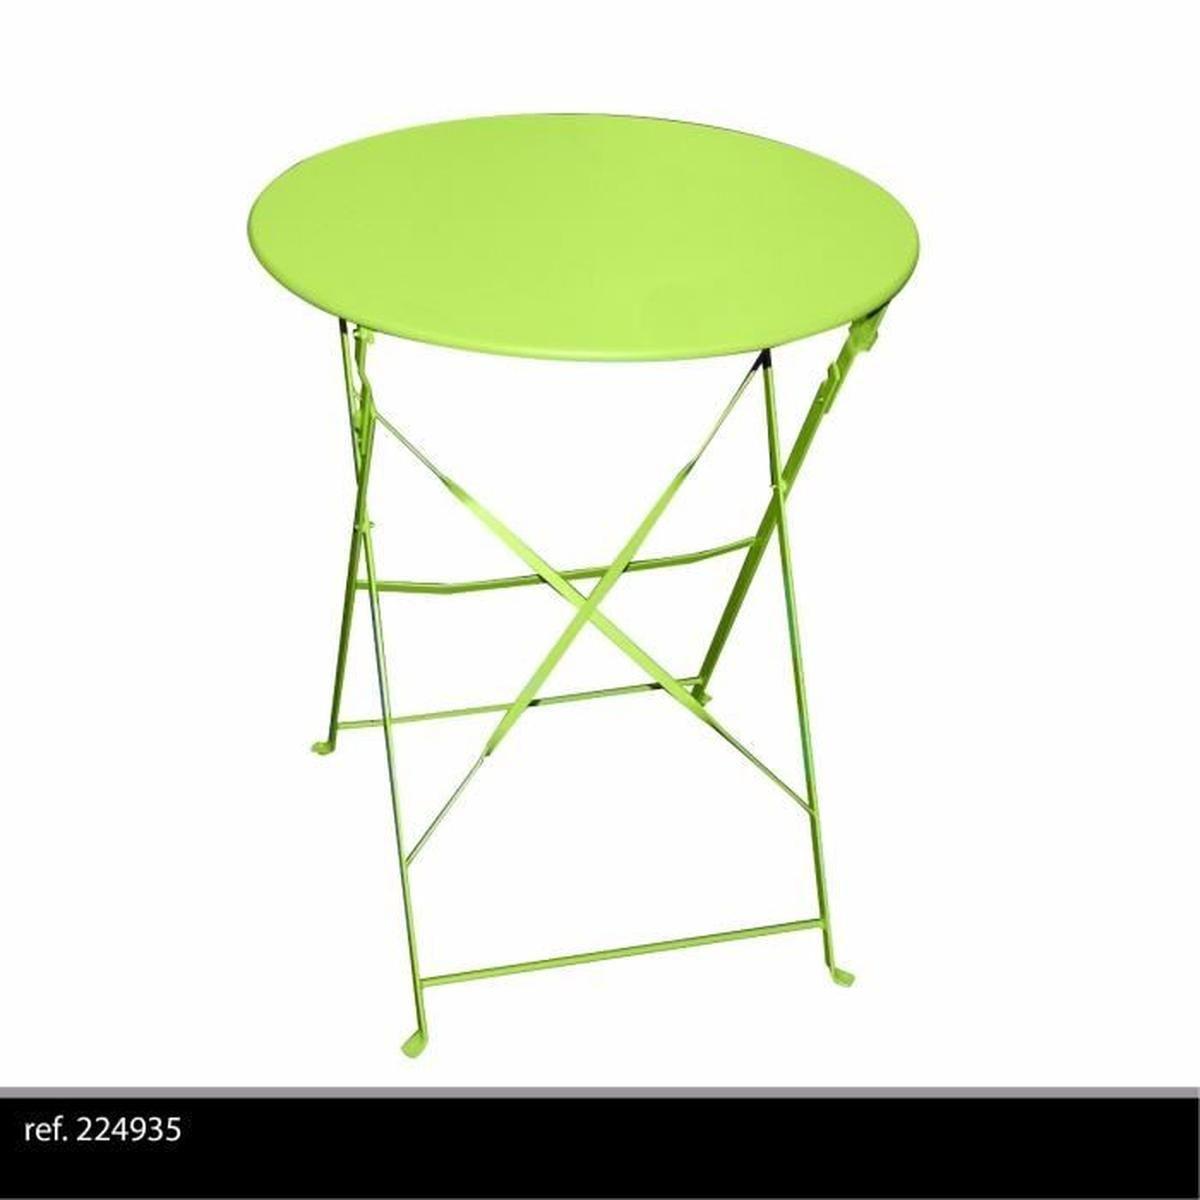 Table Ronde De Jardin En Metal Bistro Cafe Salon Pliante Verte Pliable  Exterieur concernant Table De Jardin Verte